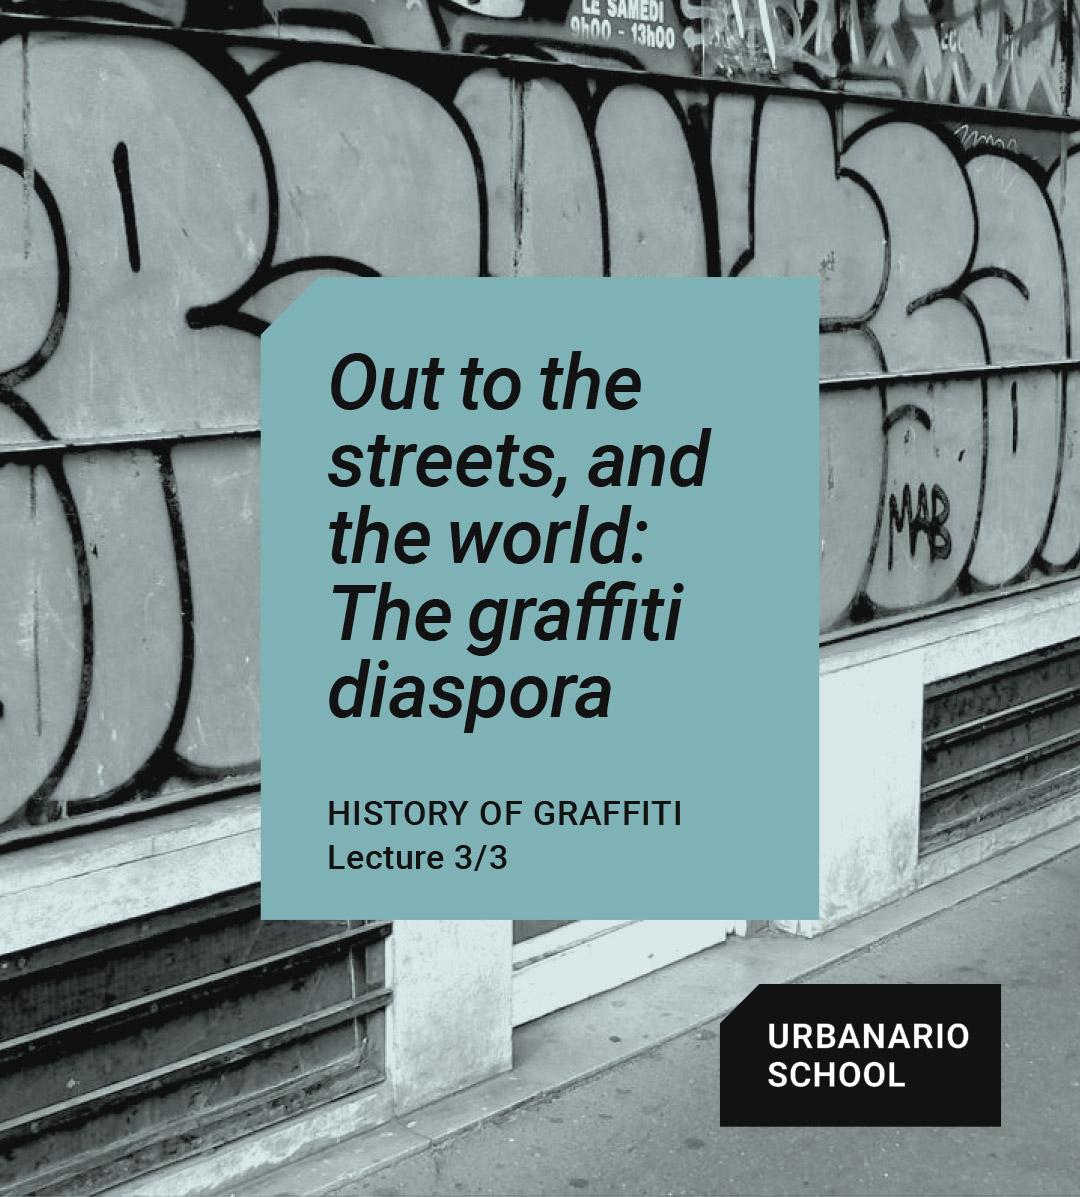 The graffiti diaspora - Urbanario School